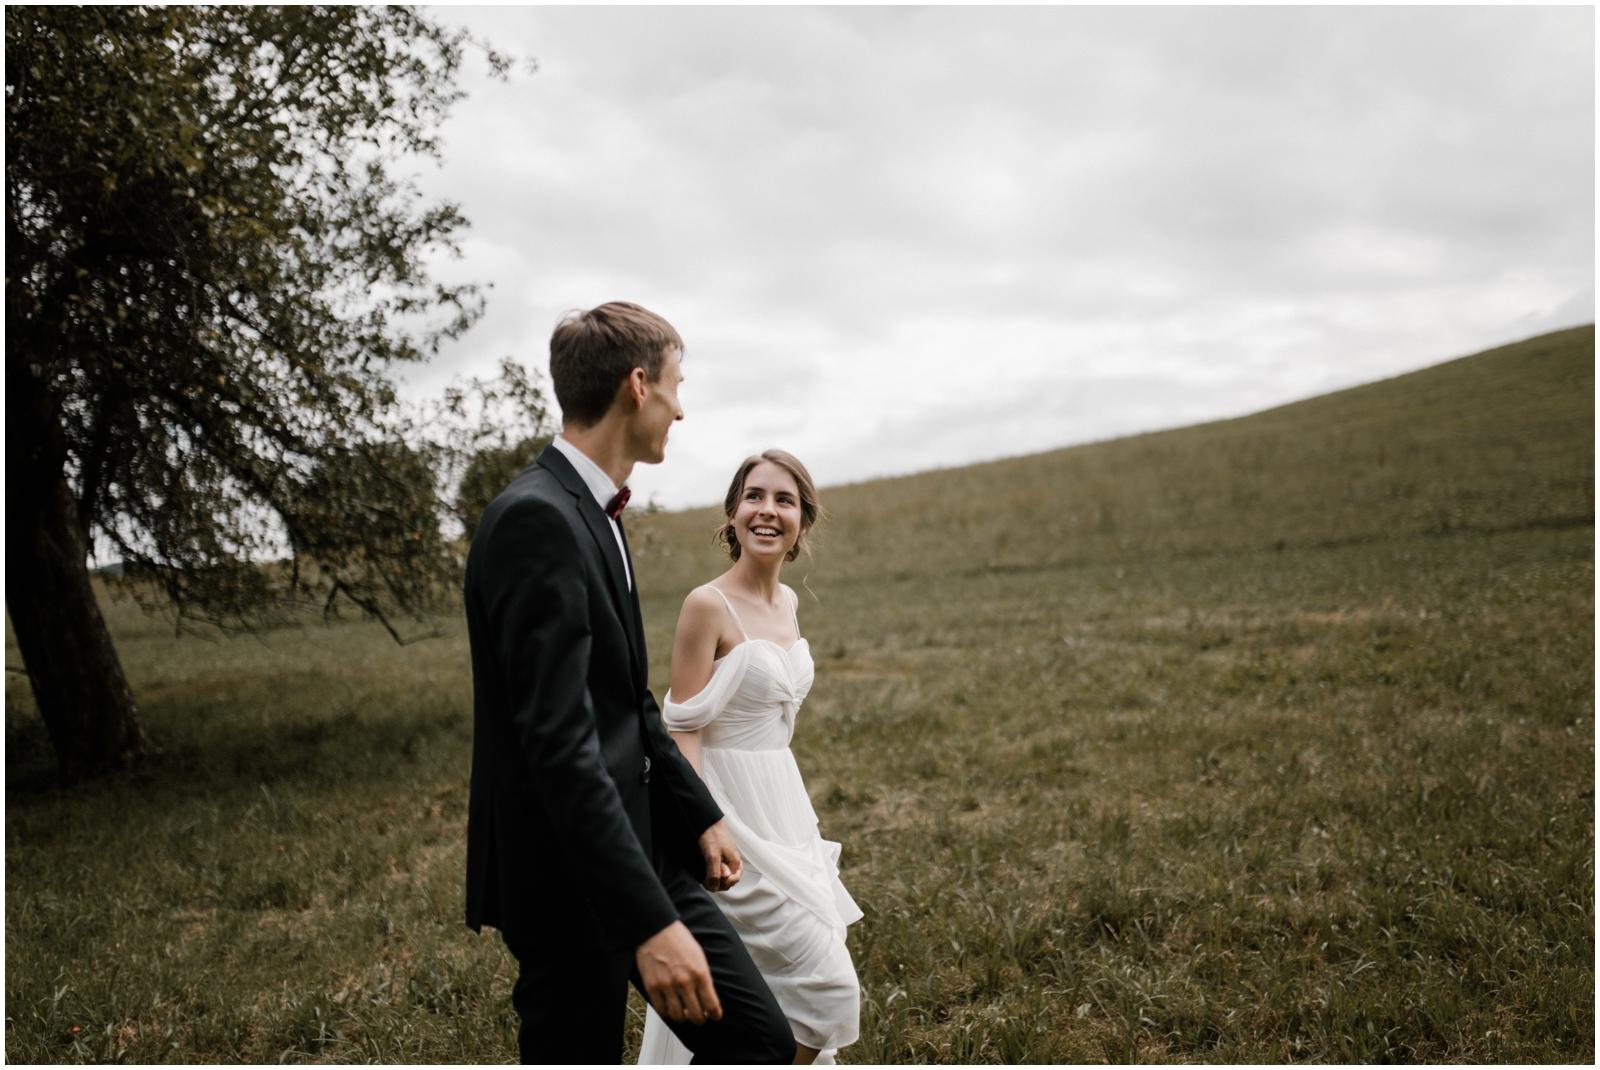 mirjam_thomas_wedding-140.jpg